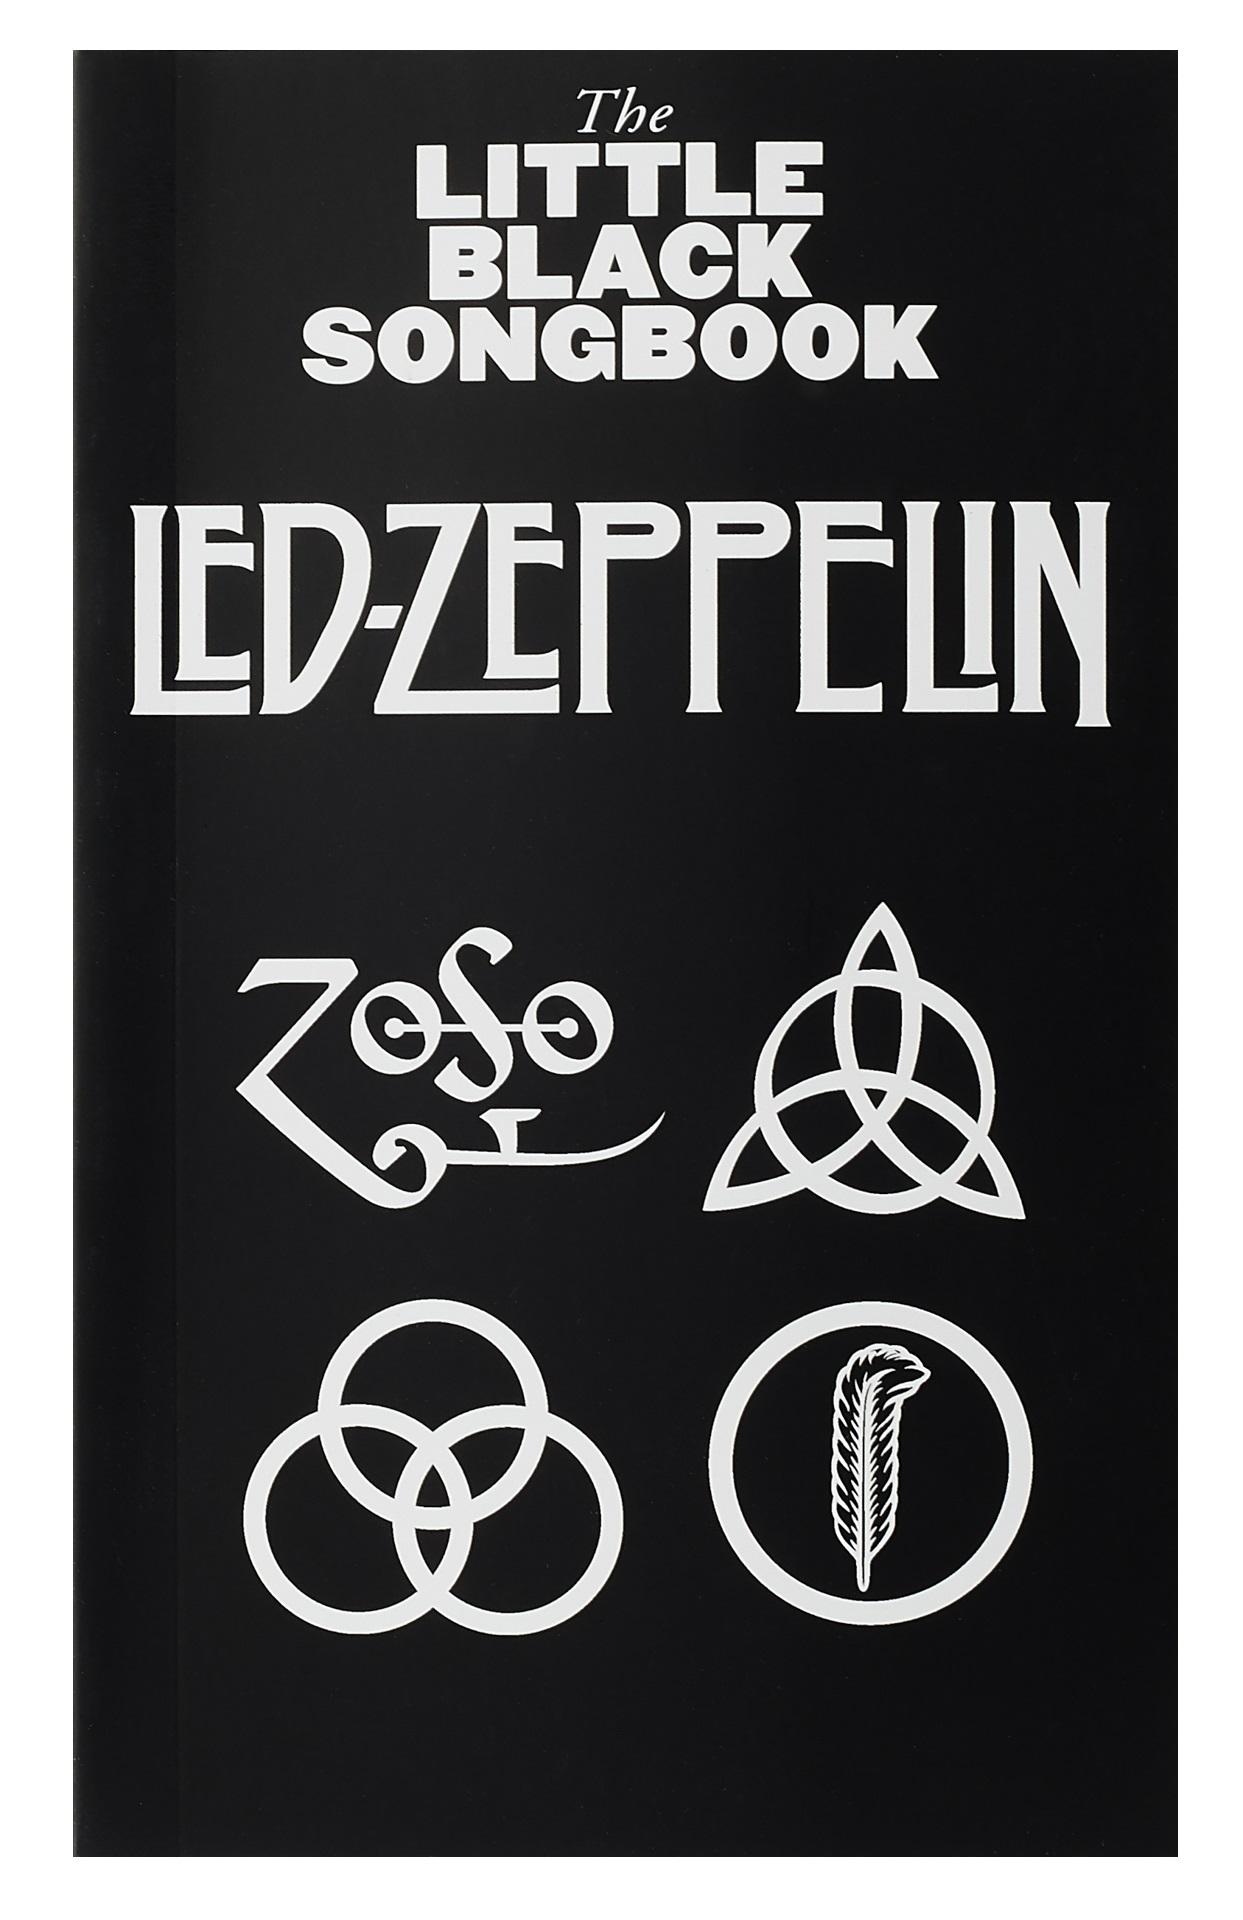 MS The Little Black Songbook: Led Zeppelin